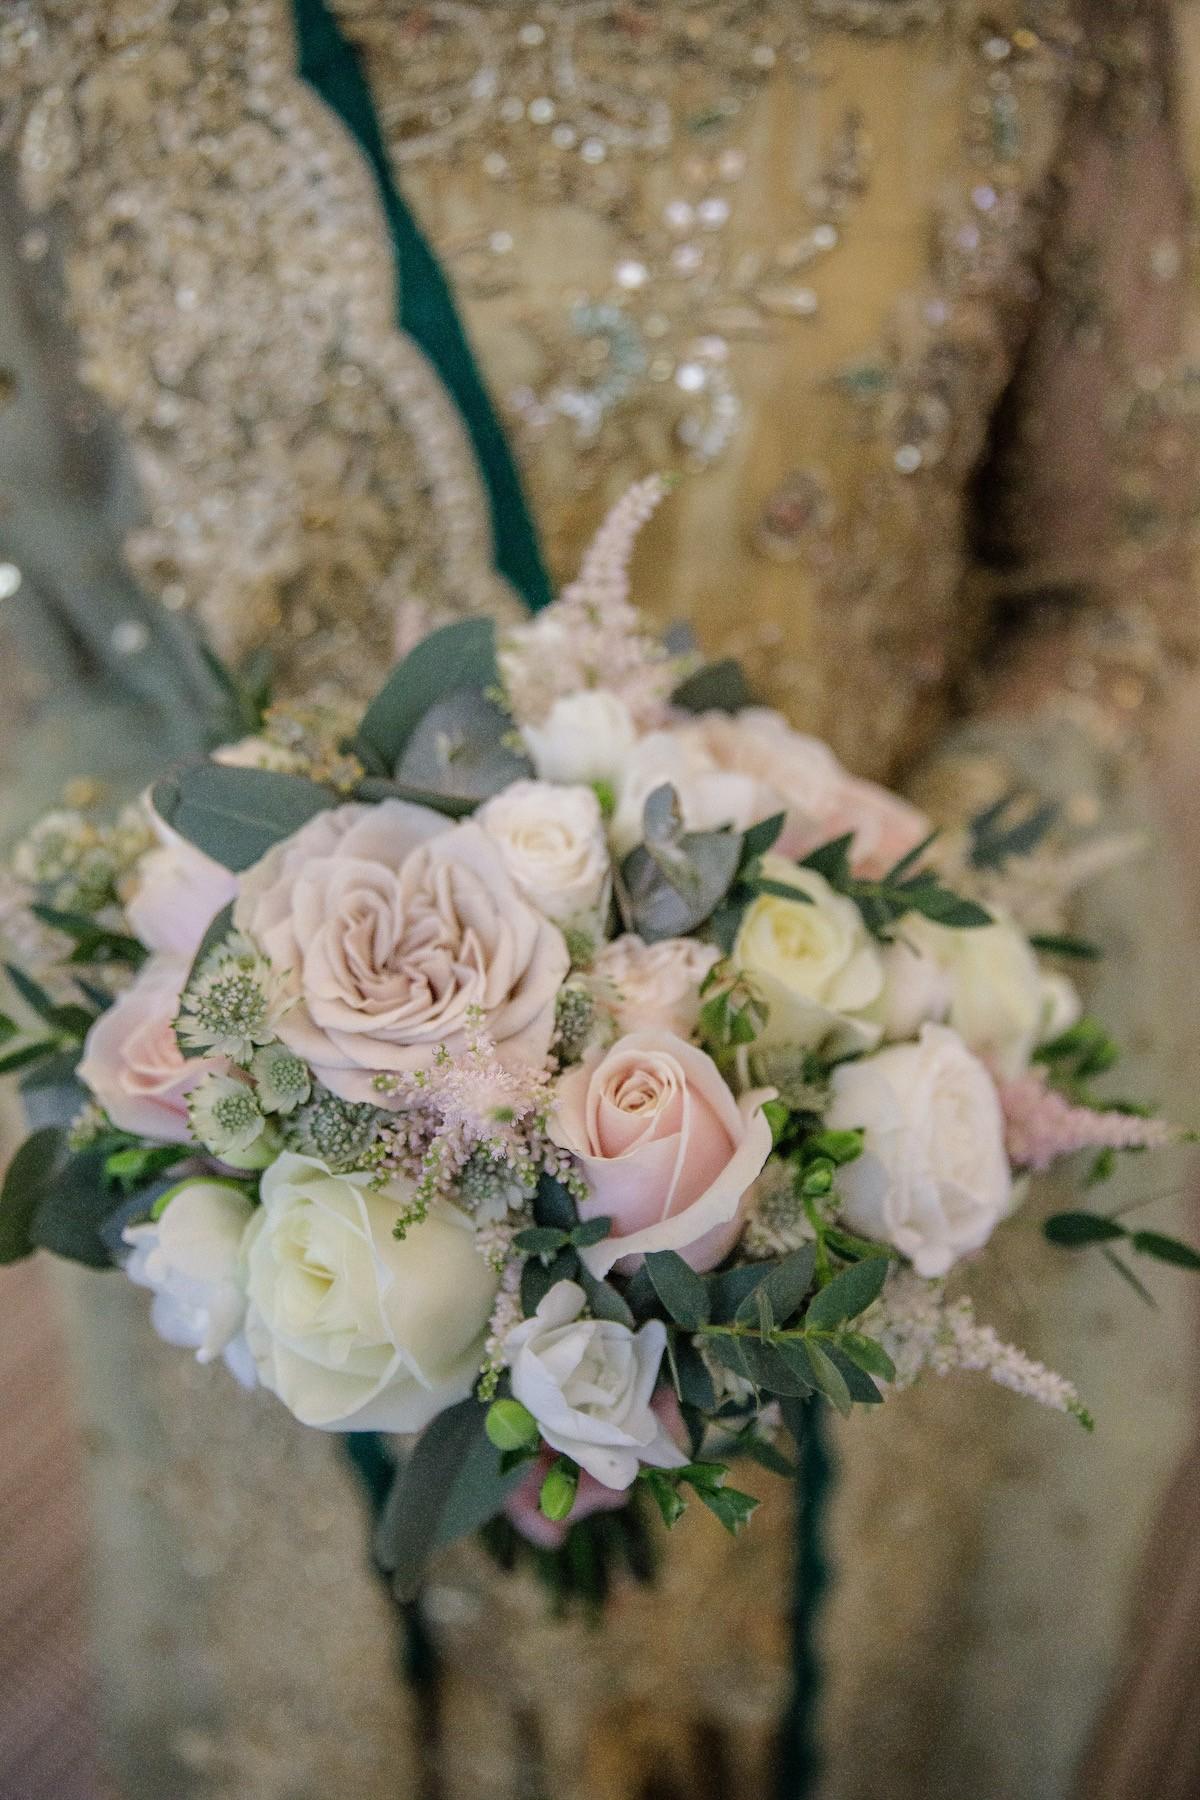 Nadia's bridal bouquet